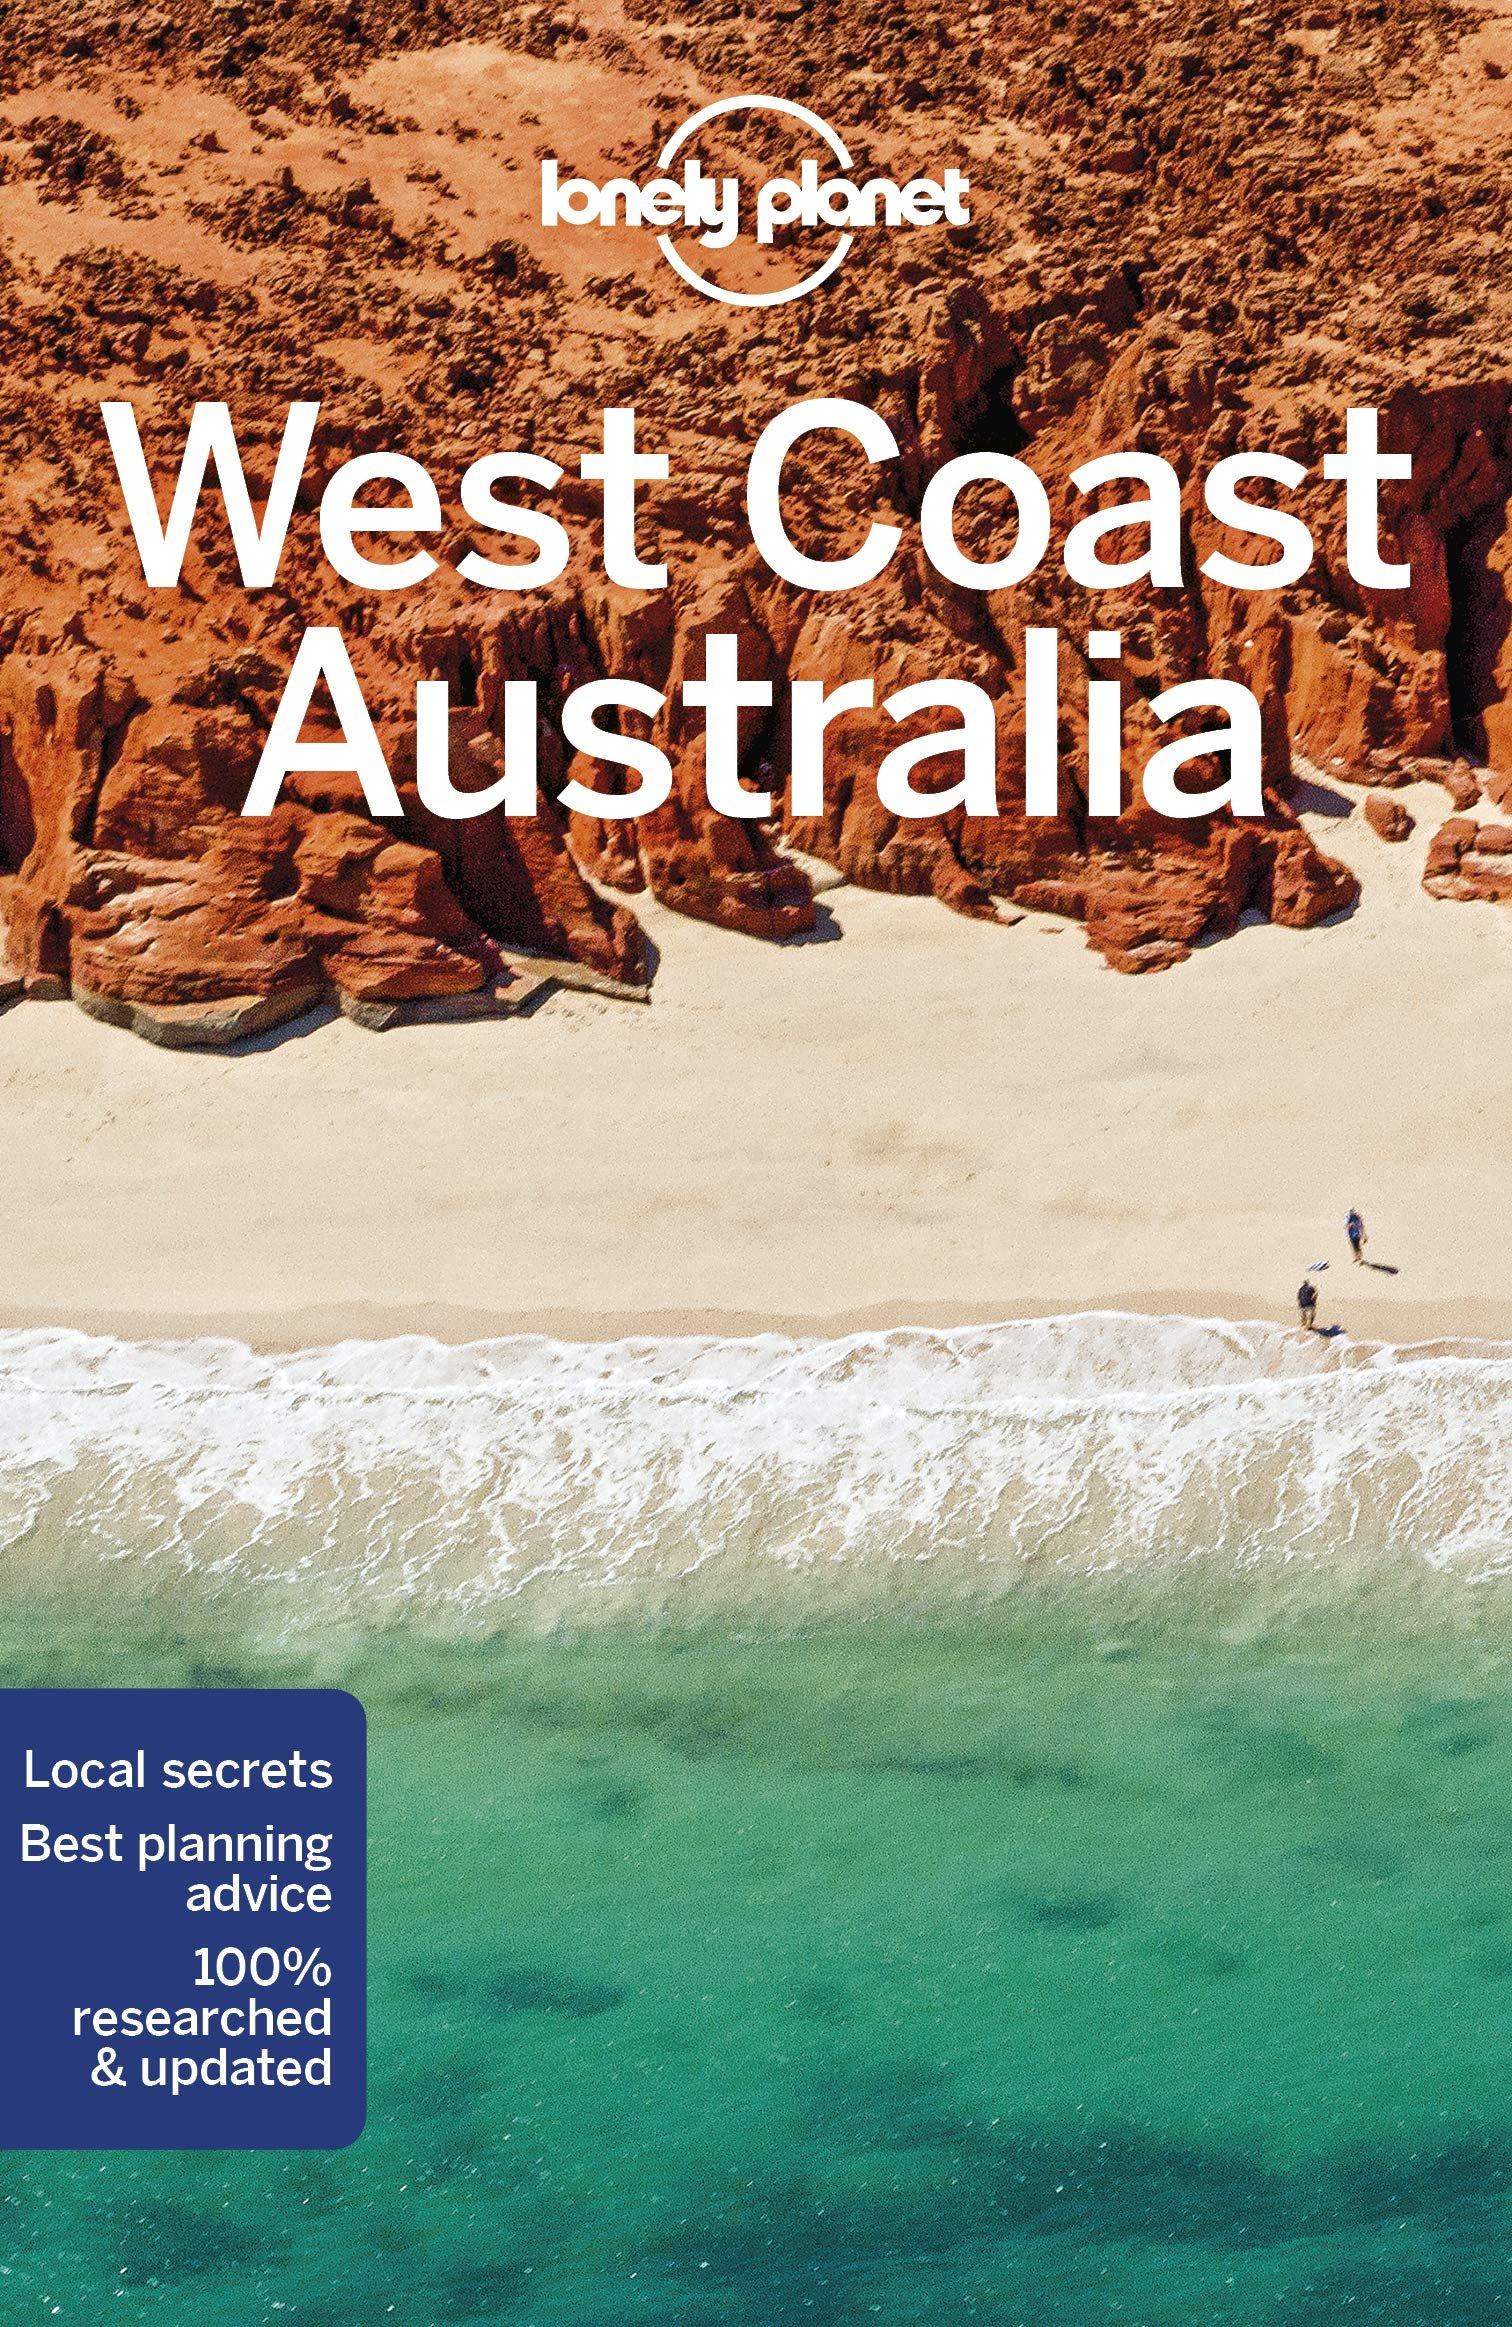 Lonely Planet  West Coast Australia 9781787013896  Lonely Planet Travel Guides  Reisgidsen Australië